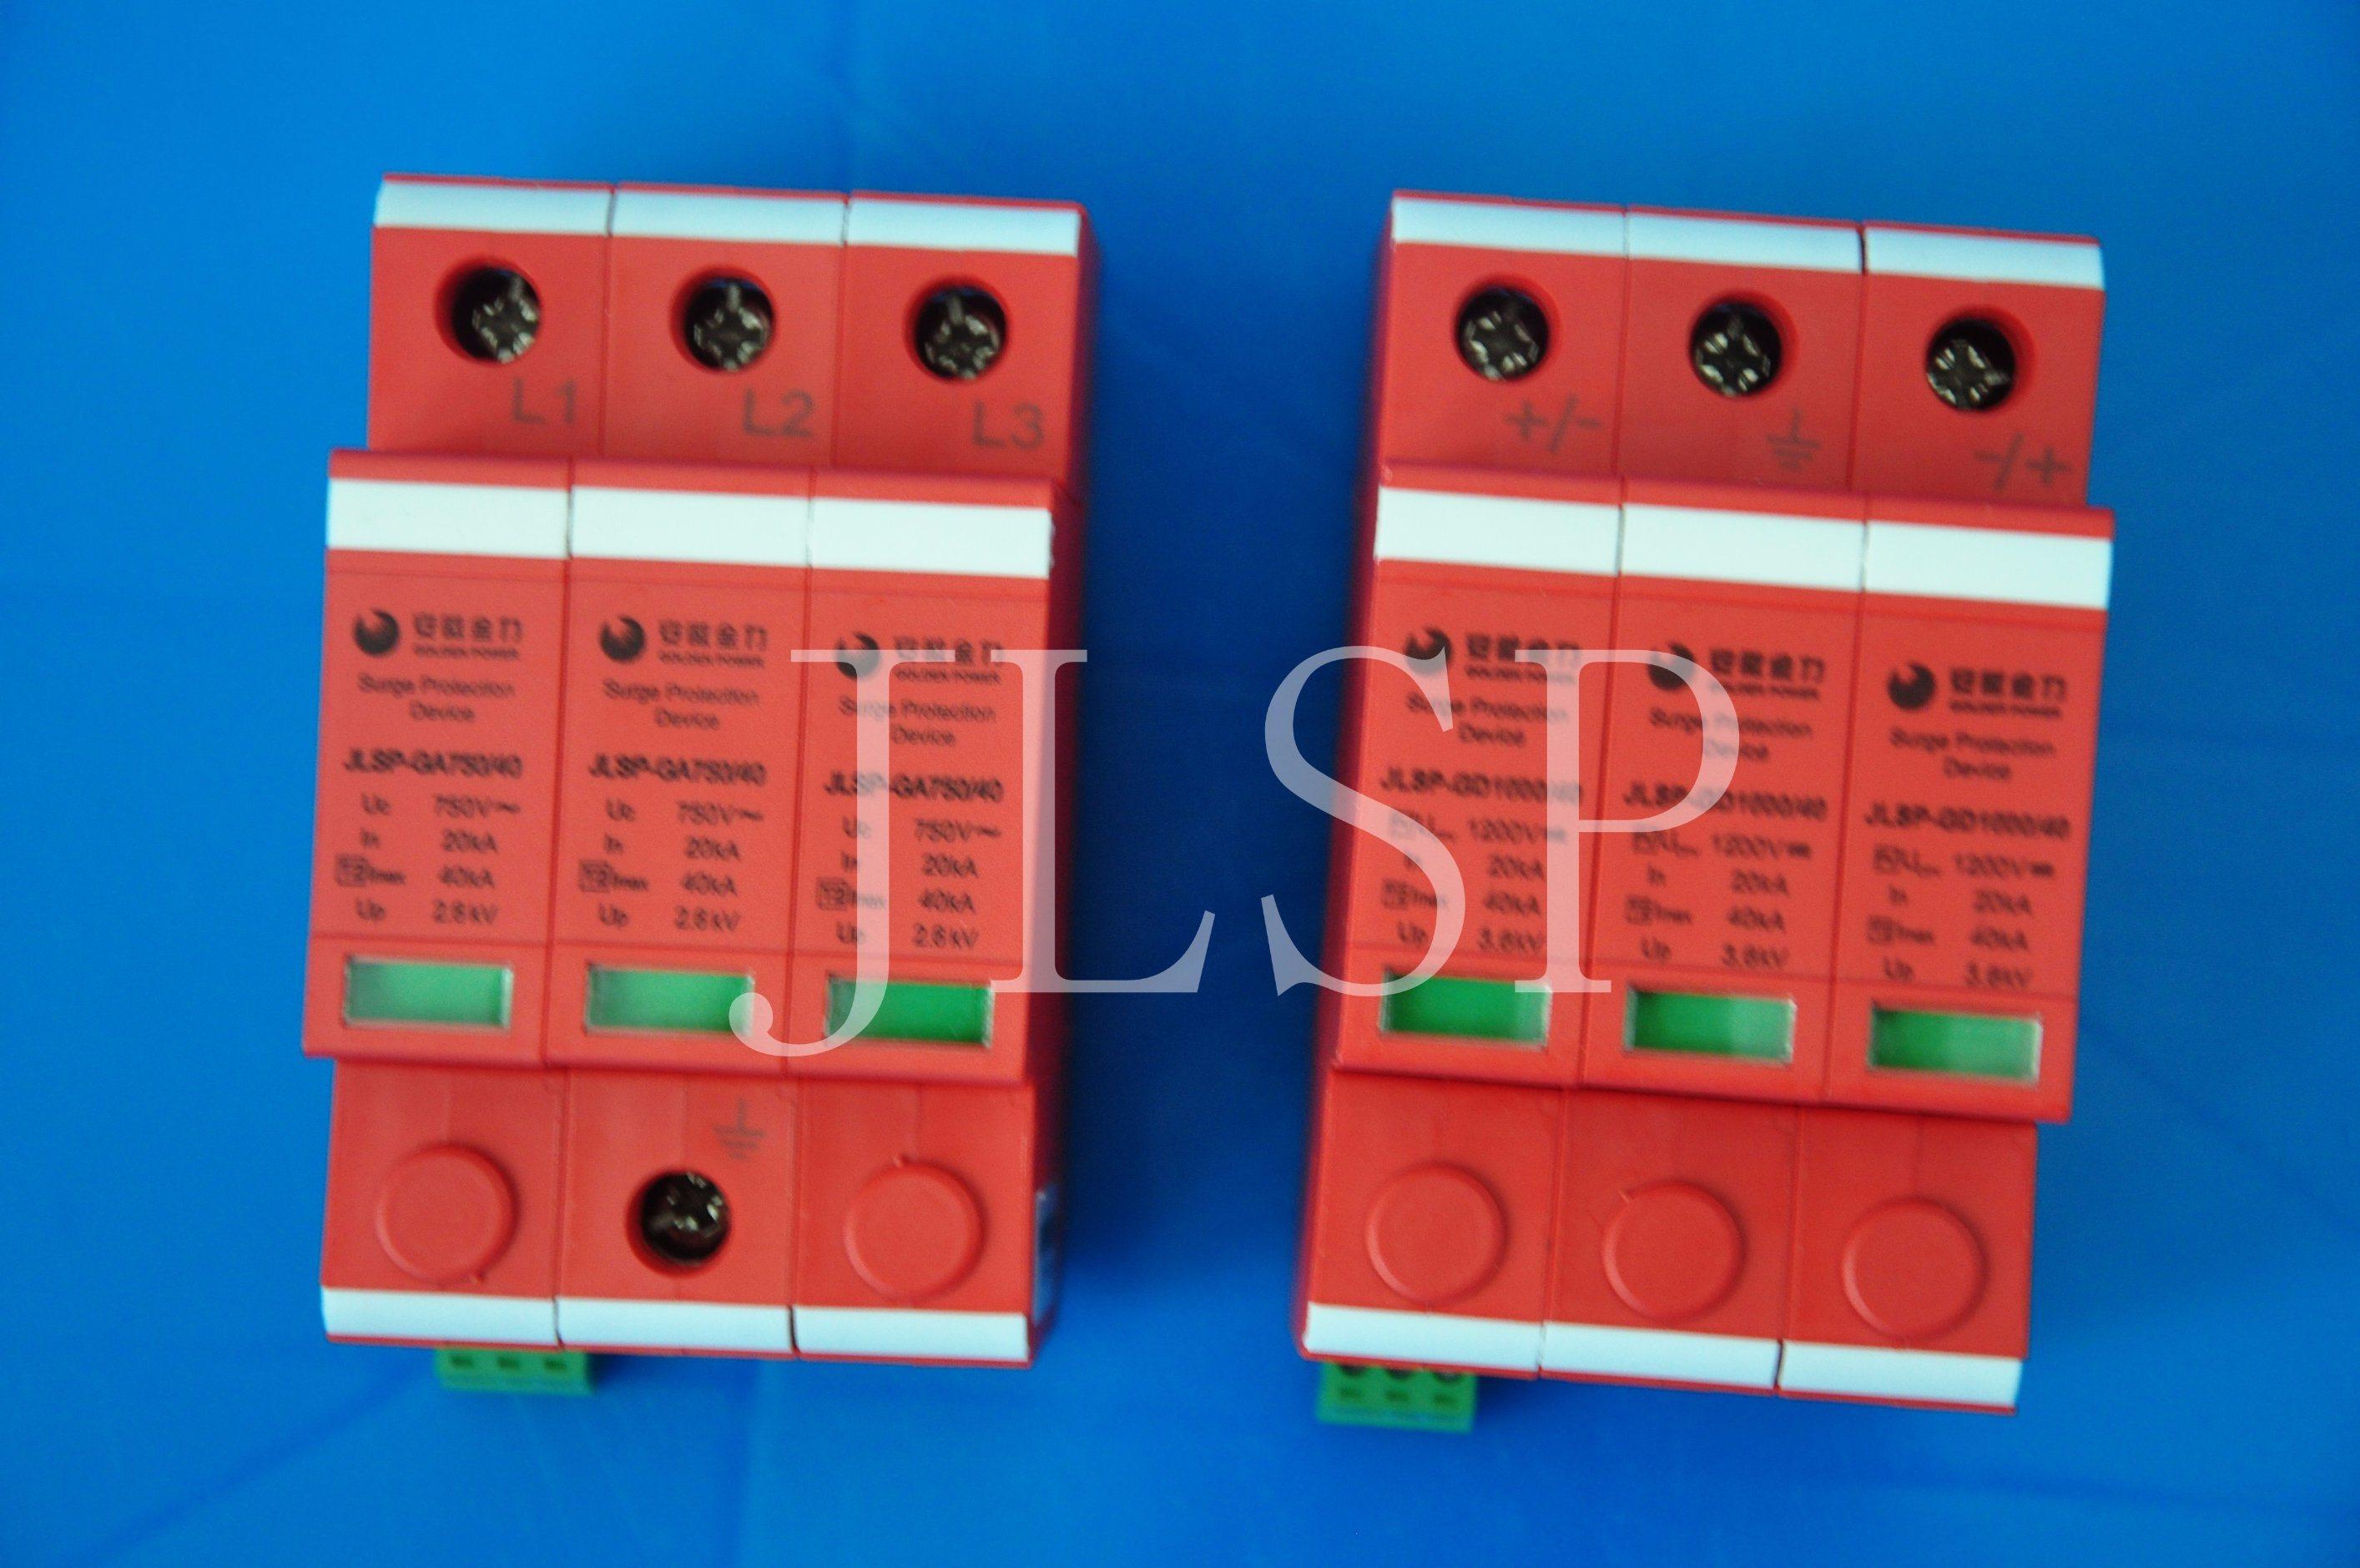 PV Application 20-40ka Solar 3p DC 1000V, Jlsp-Gd1000-40, SPD, Surge Protector, 17001